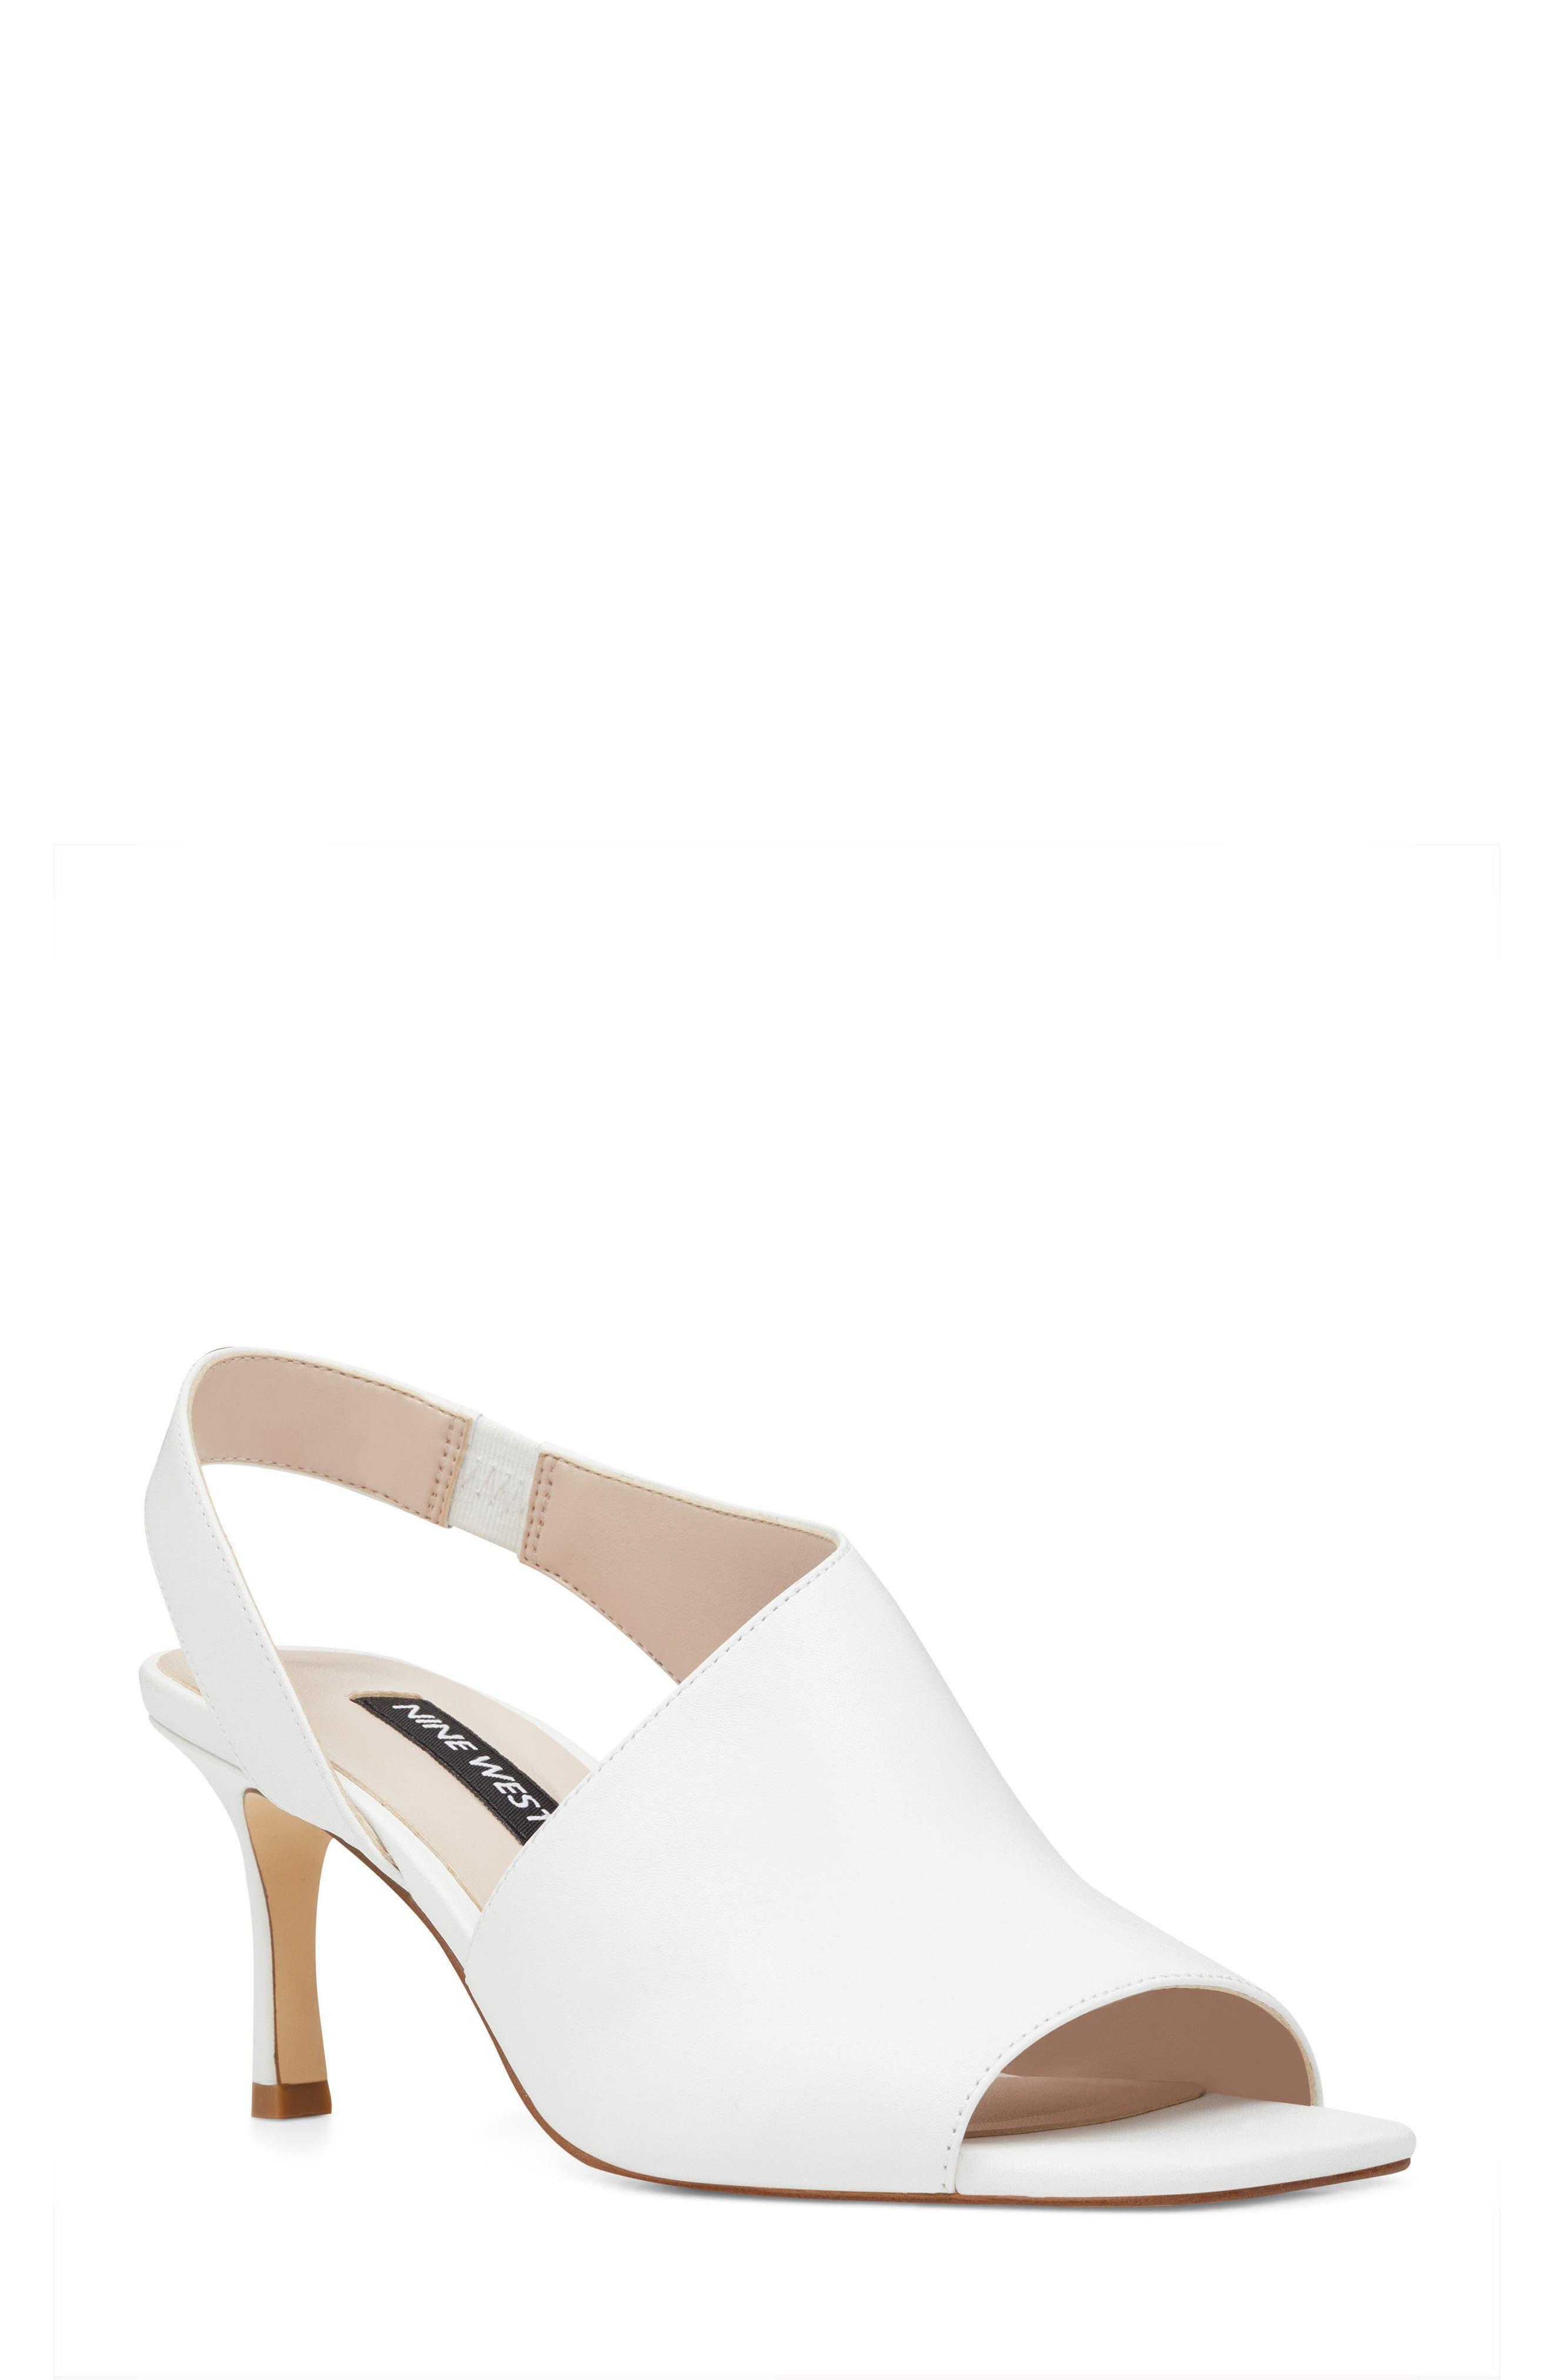 Orrus Asymmetrical Sandal,                         Main,                         color, White Leather